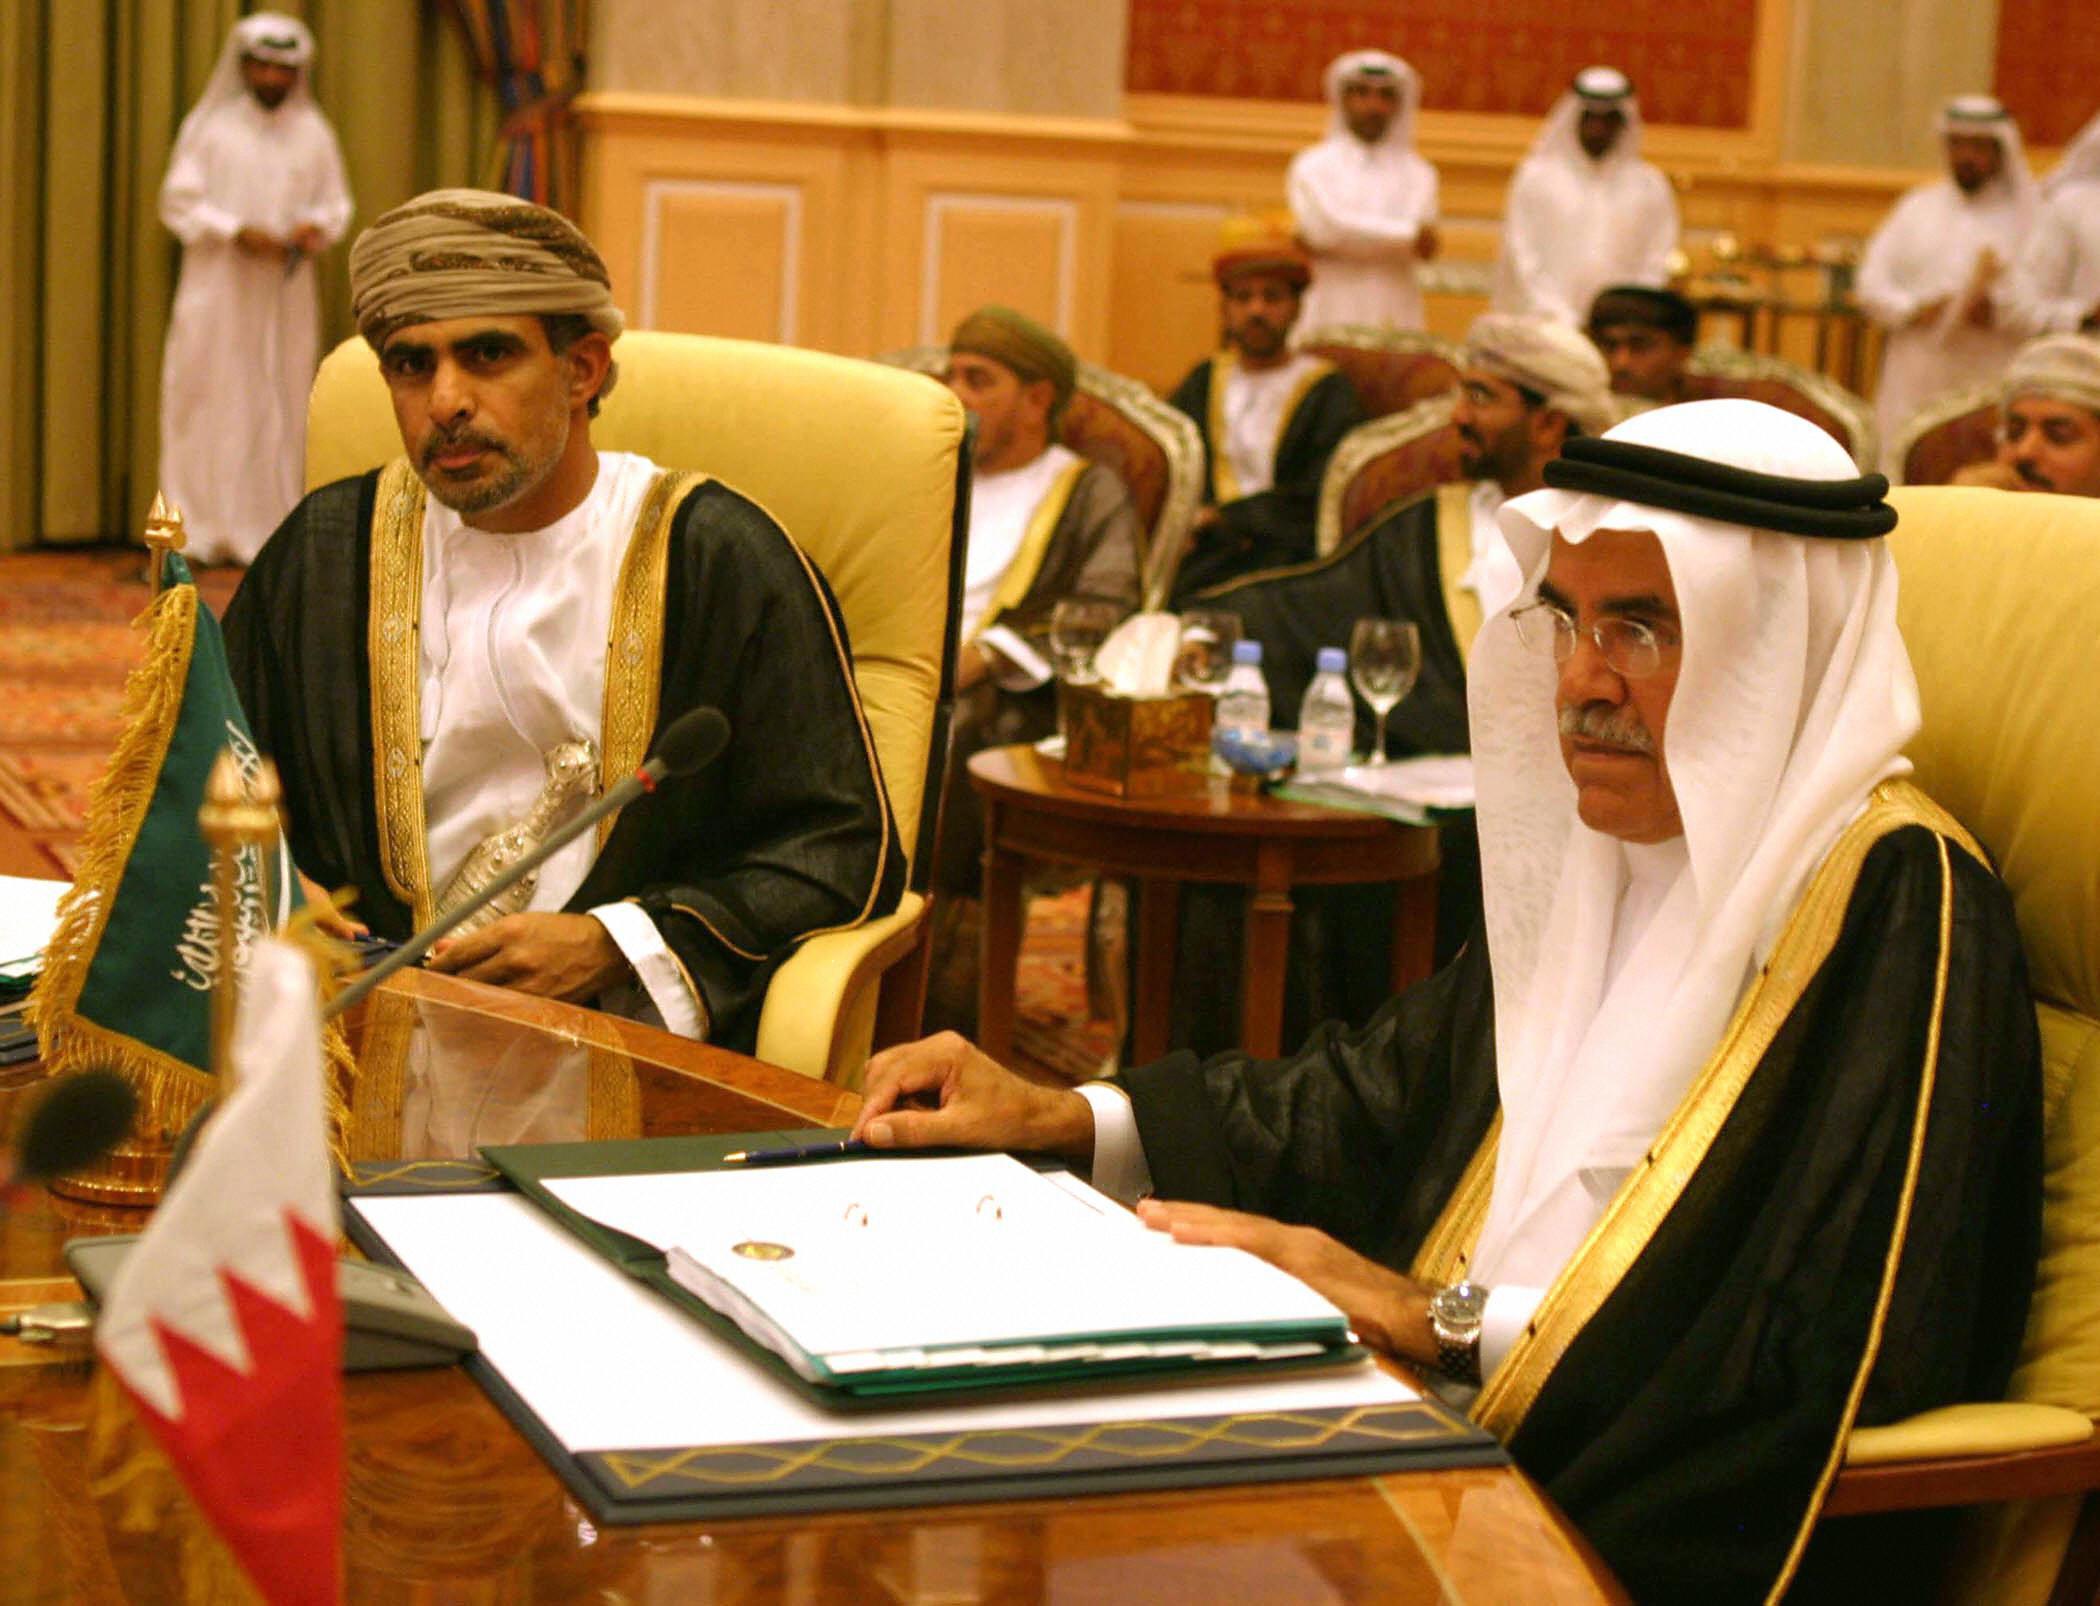 Saudi's Oil Minister Ali al-Nuaimi, right, sits next to Oman's Oil and Gas minister Mohammad bin Hamad bin Saif al-Romhi.